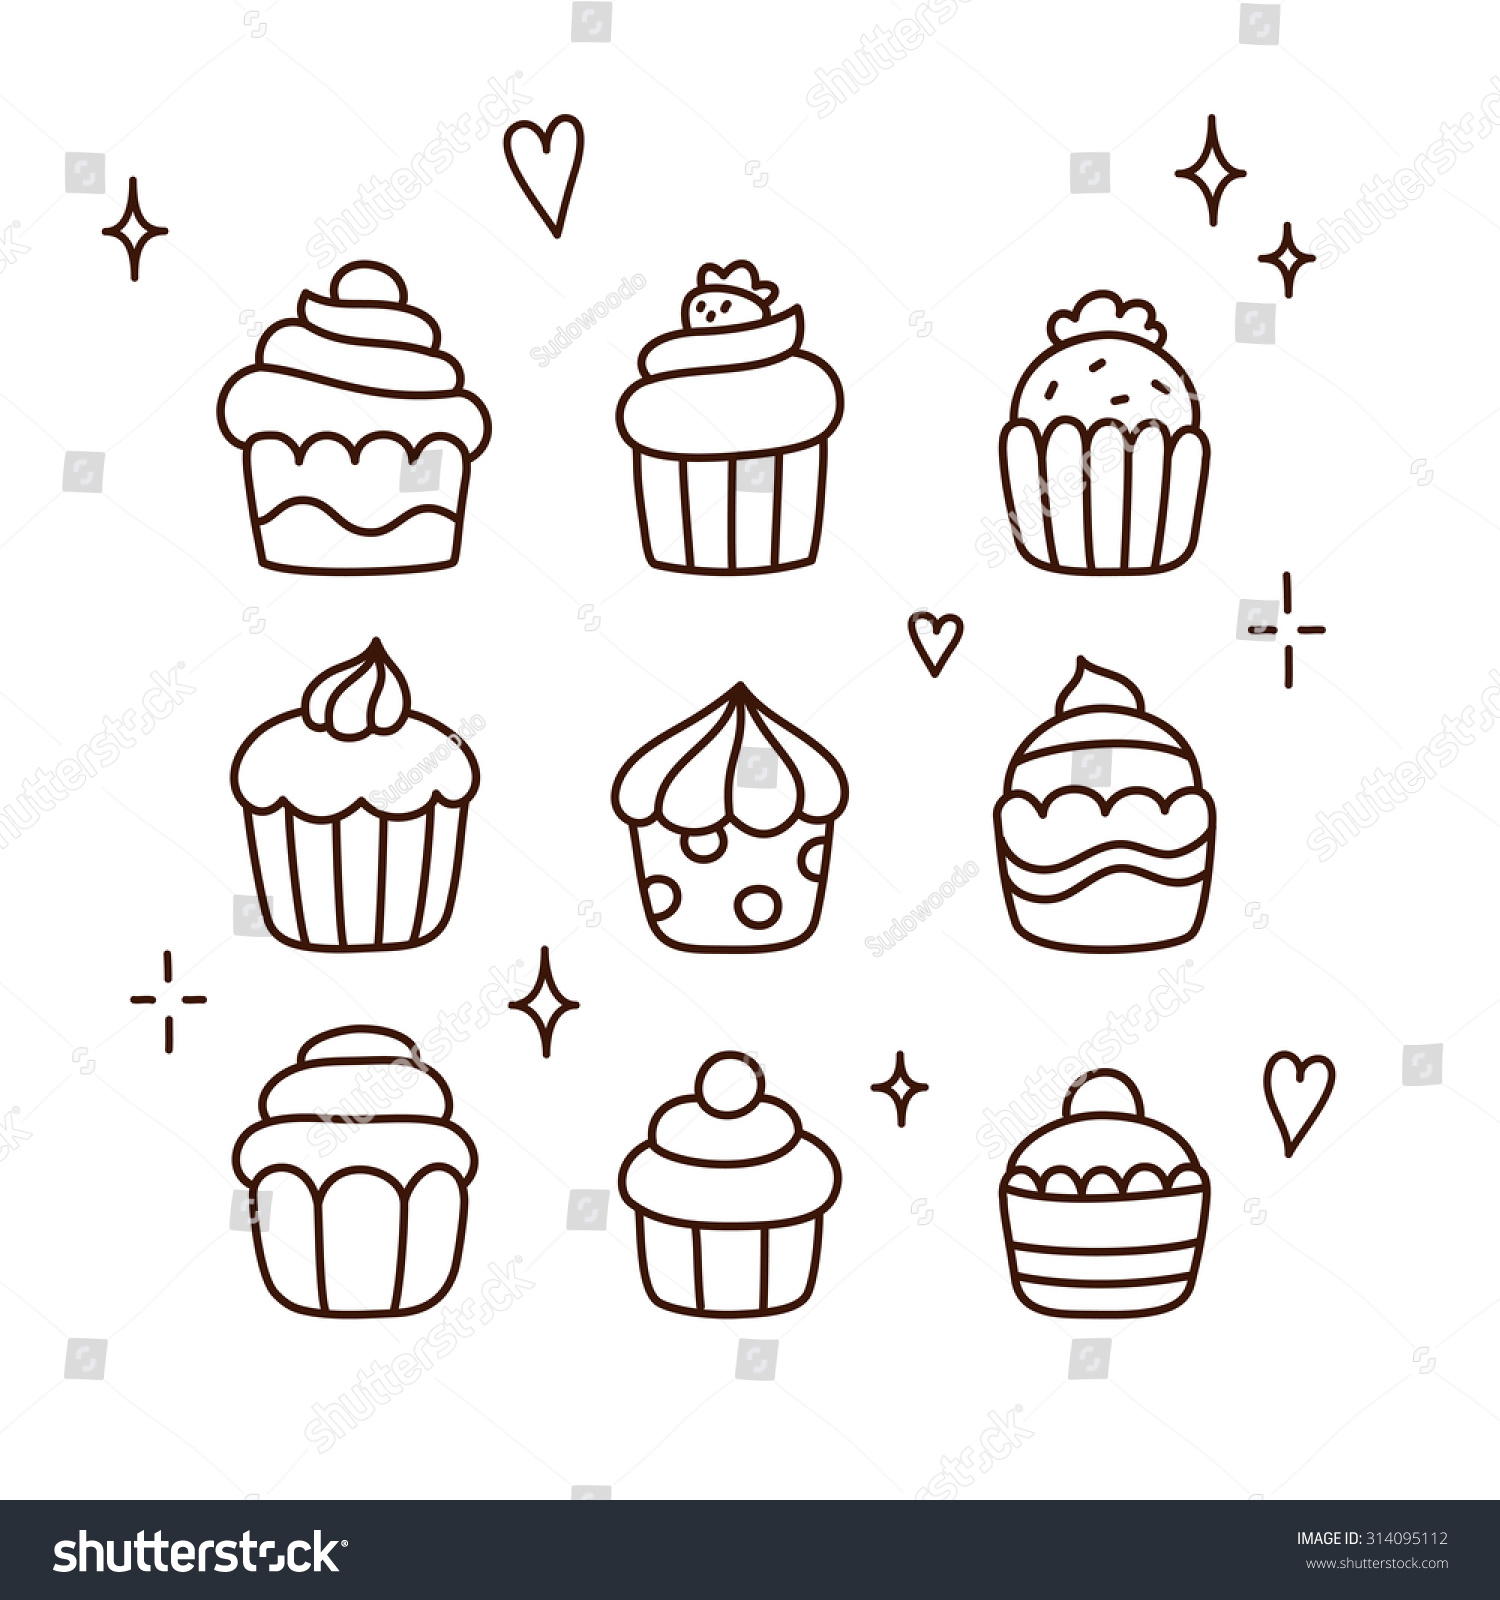 Cake Line Art Vector Free Download : Set Cute Cartoon Cupcake Doodles Hand Stock Vector ...